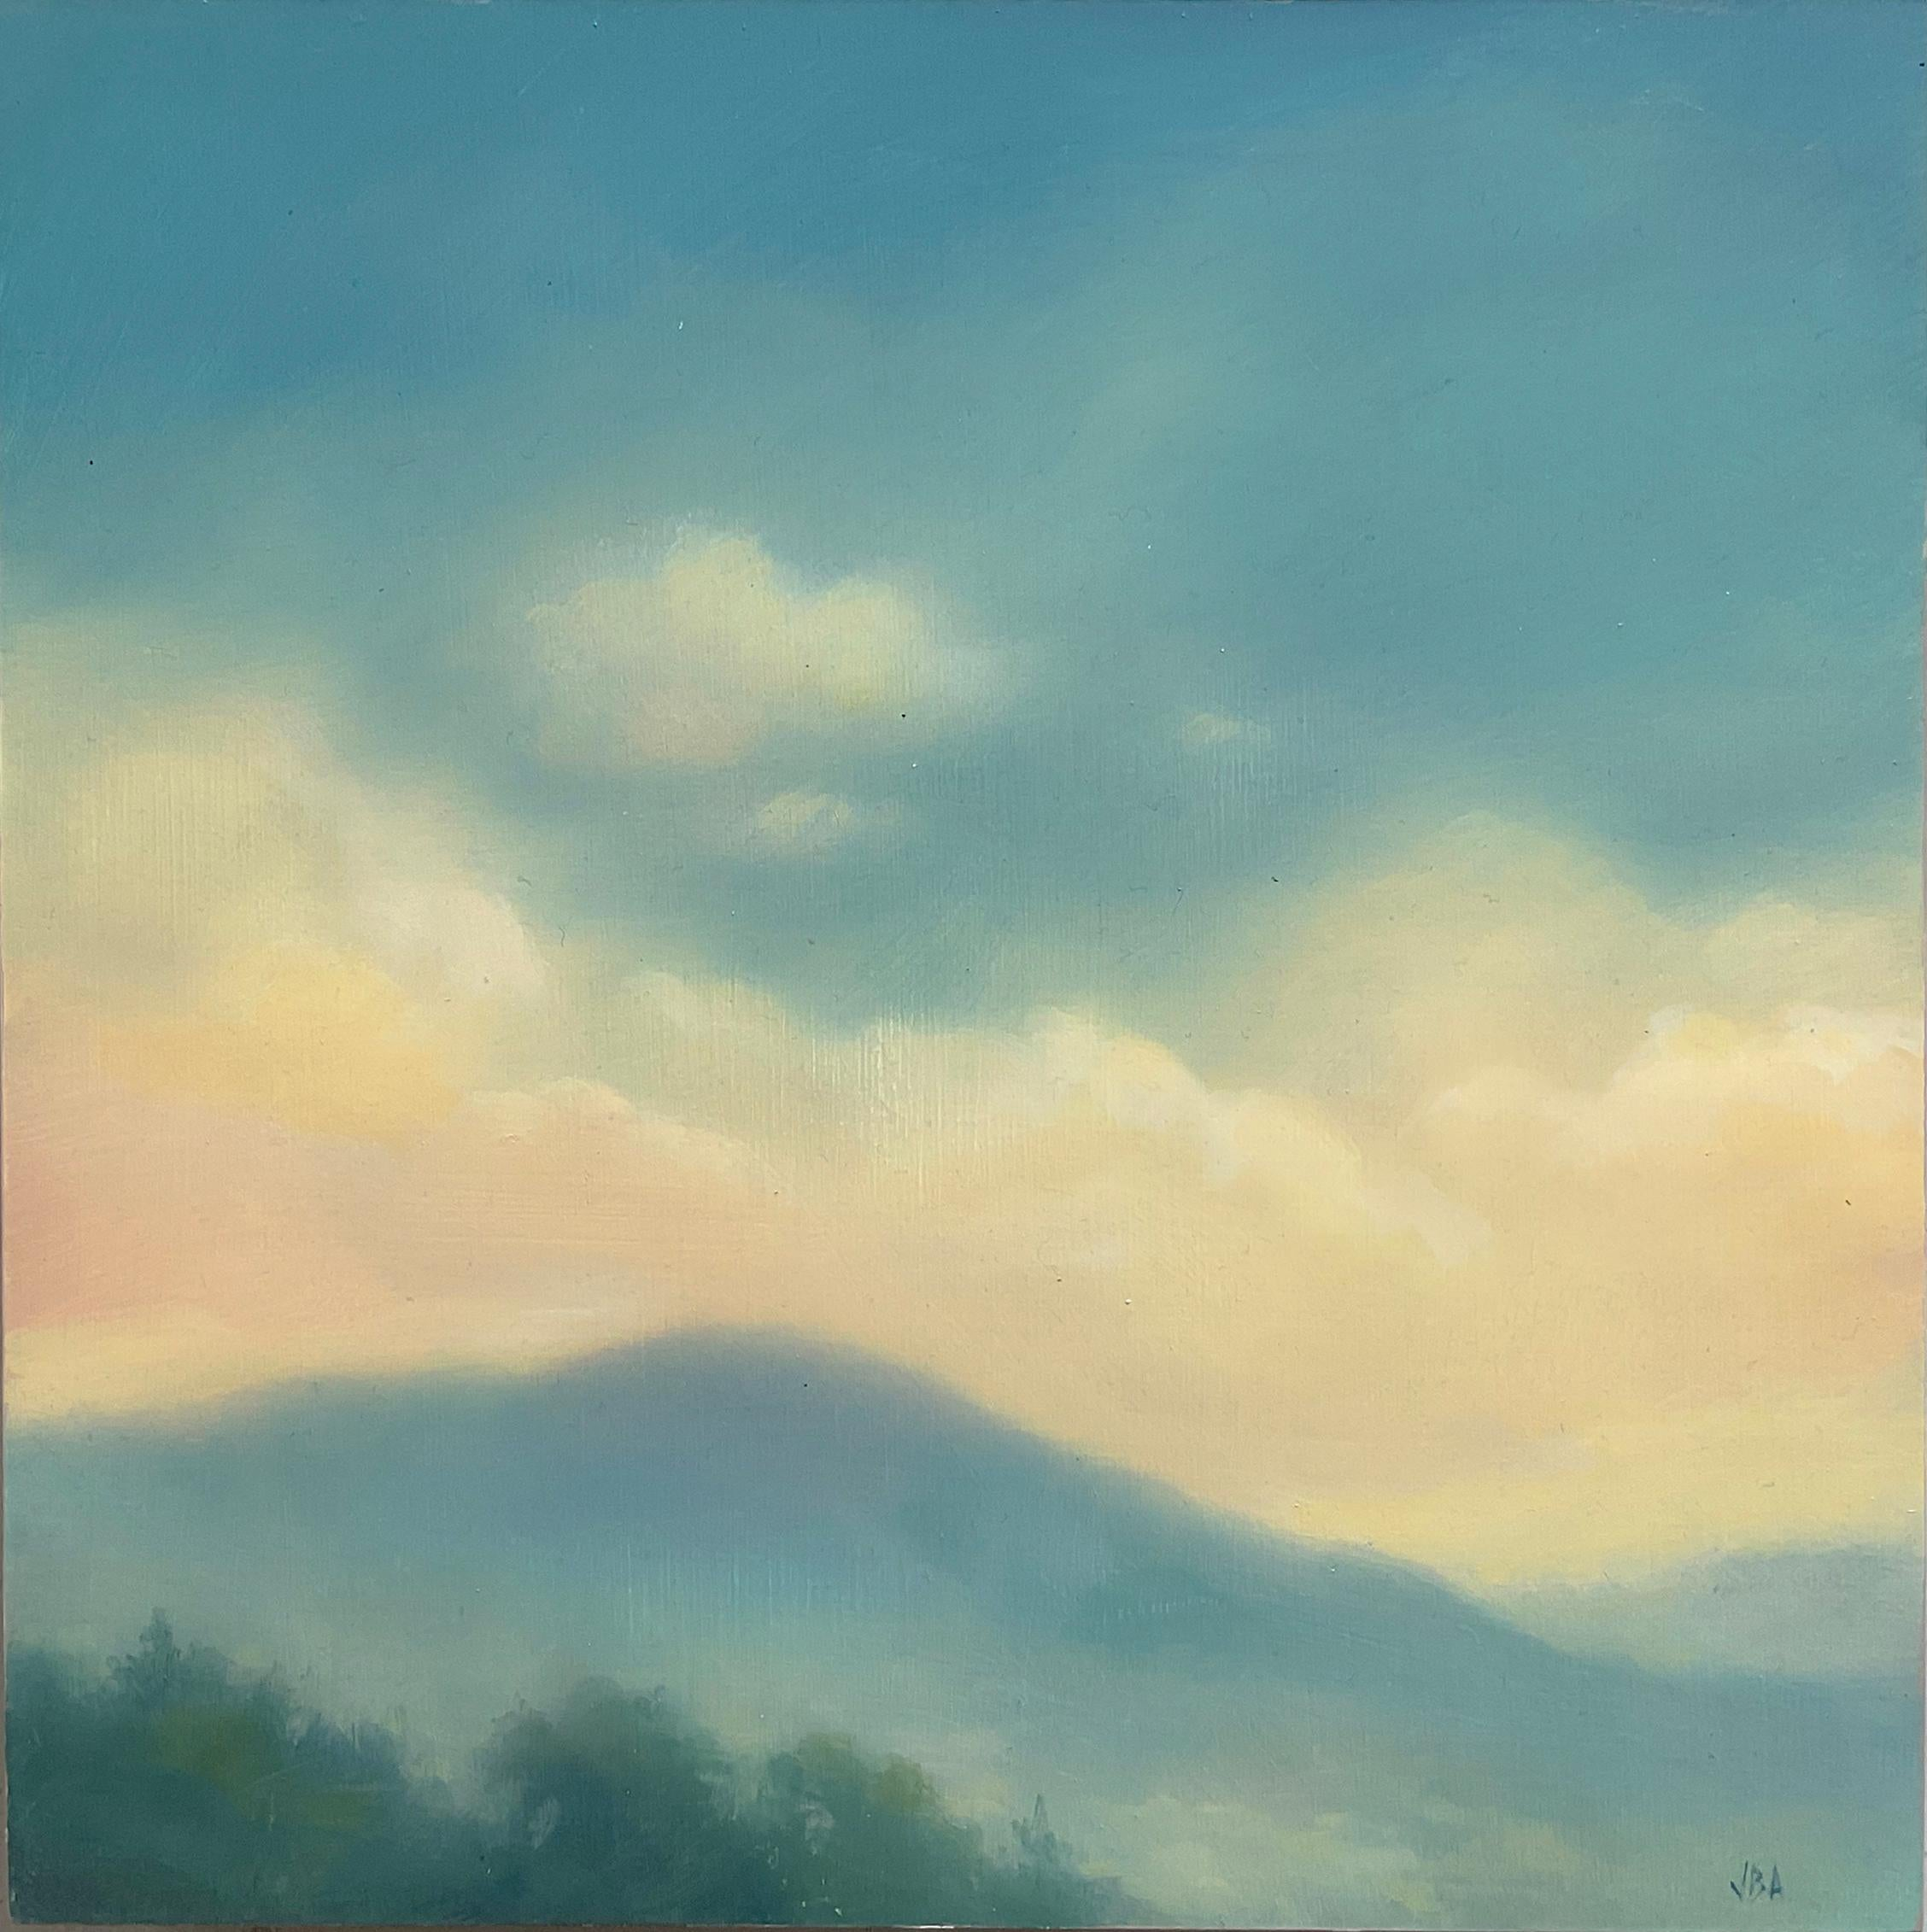 Catskills Spring No. 1 (Contemporary Hudson Valley Landscape Oil Painting)